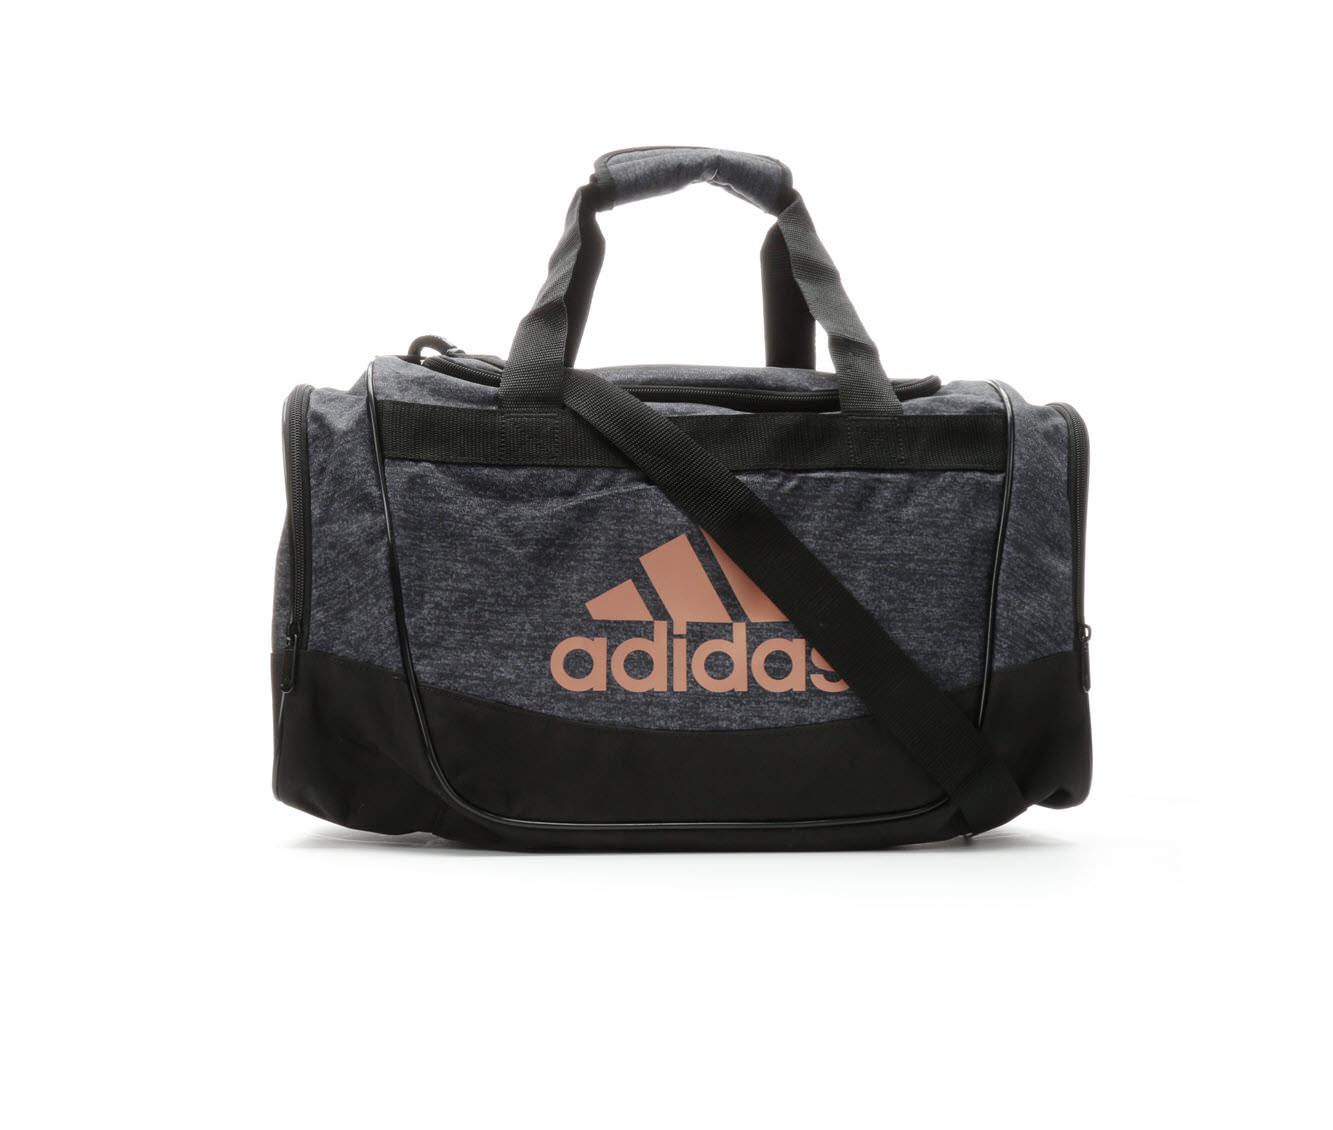 Image of Adidas Defender II Small Duffel Bag